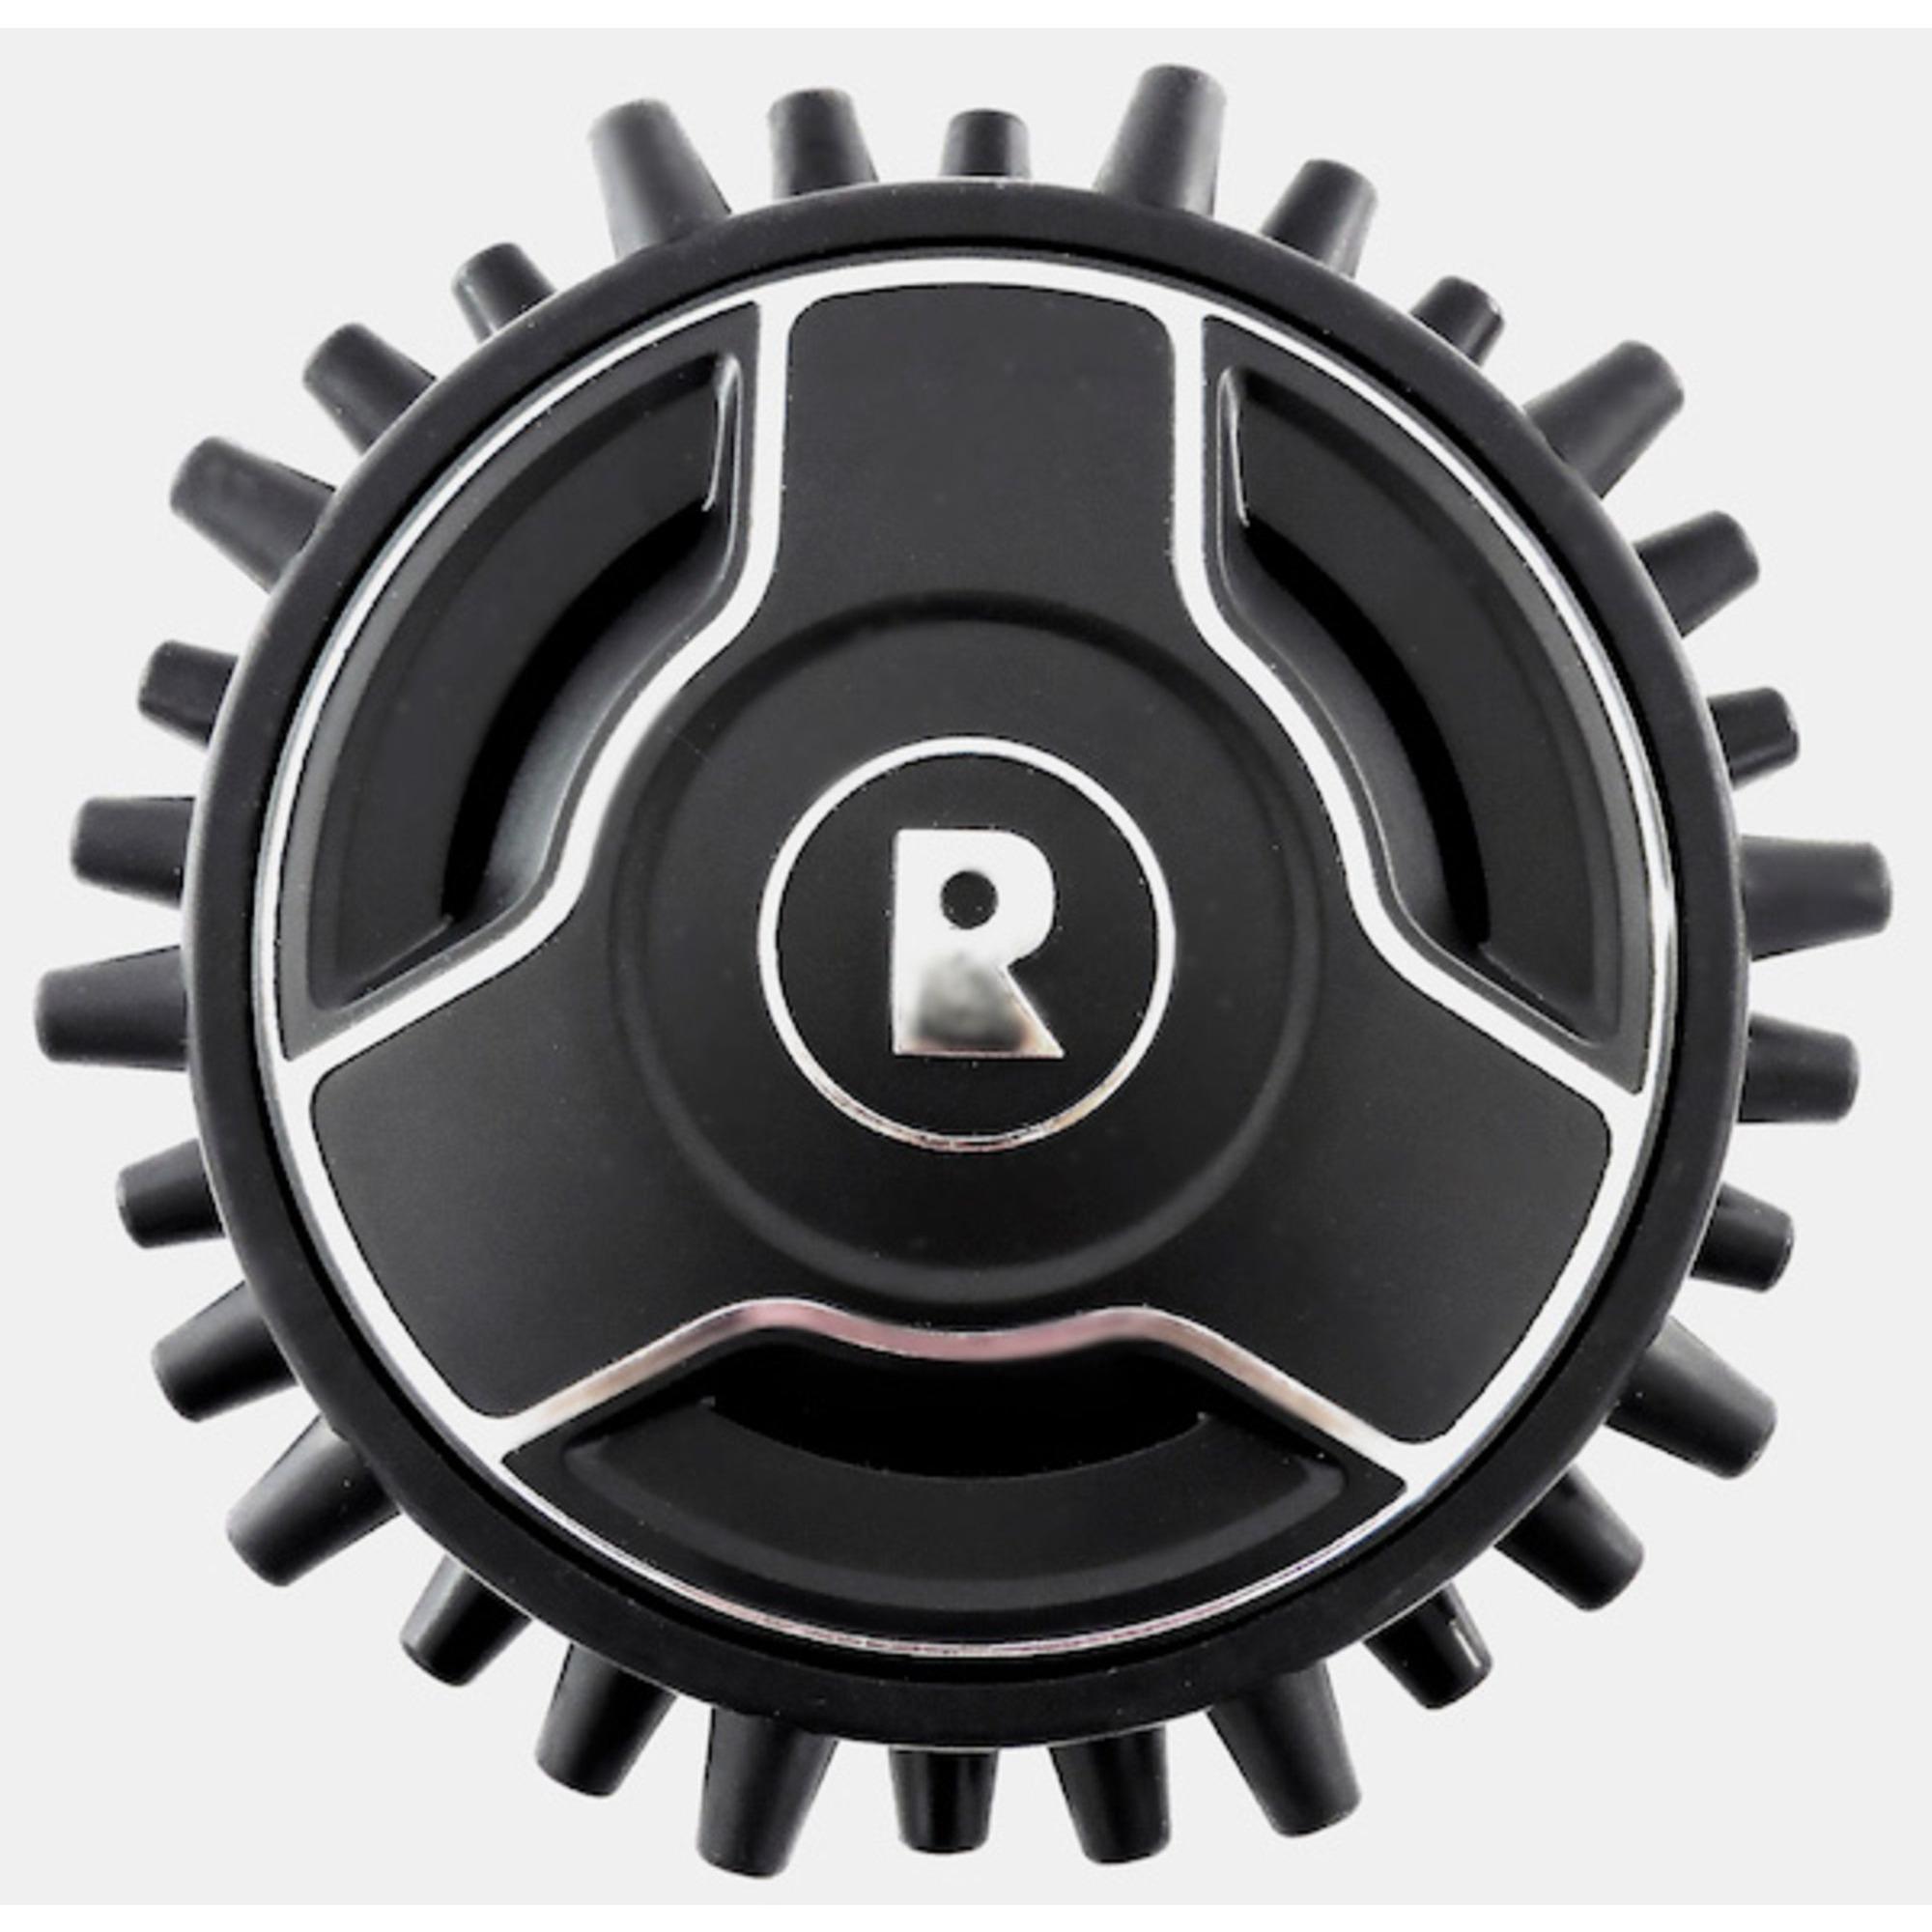 Robomow Pigghjul till RX-modeller